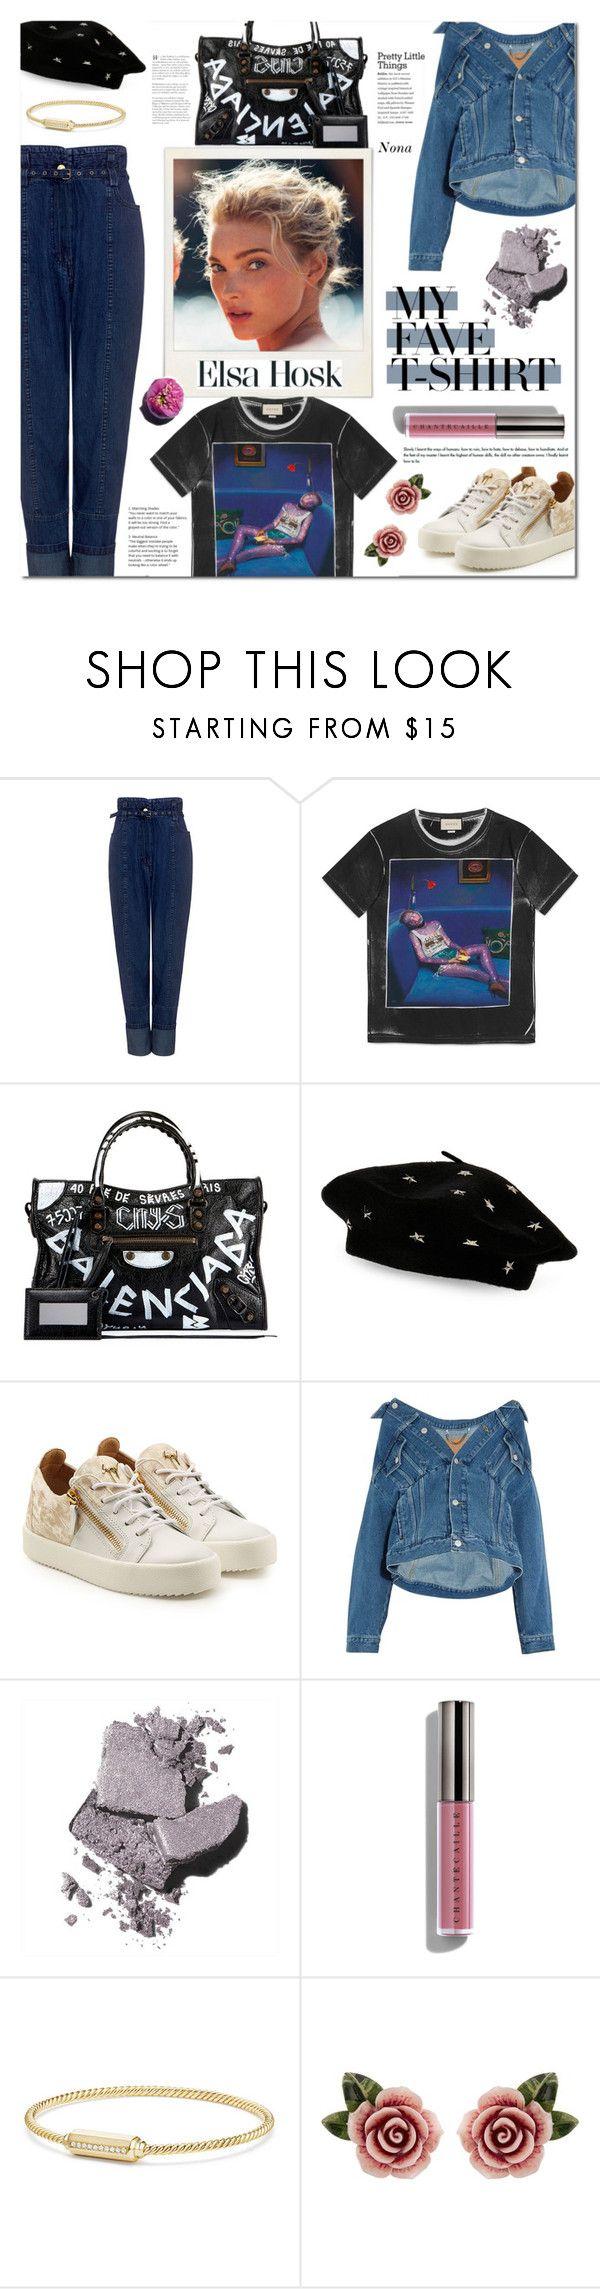 """Dress Up a T-Shirt"" by delunaray ❤ liked on Polyvore featuring Rachel Comey, Gucci, Balenciaga, Steve Madden, Giuseppe Zanotti, Bobbi Brown Cosmetics, Chantecaille, David Yurman, Dolce&Gabbana and contestentry"